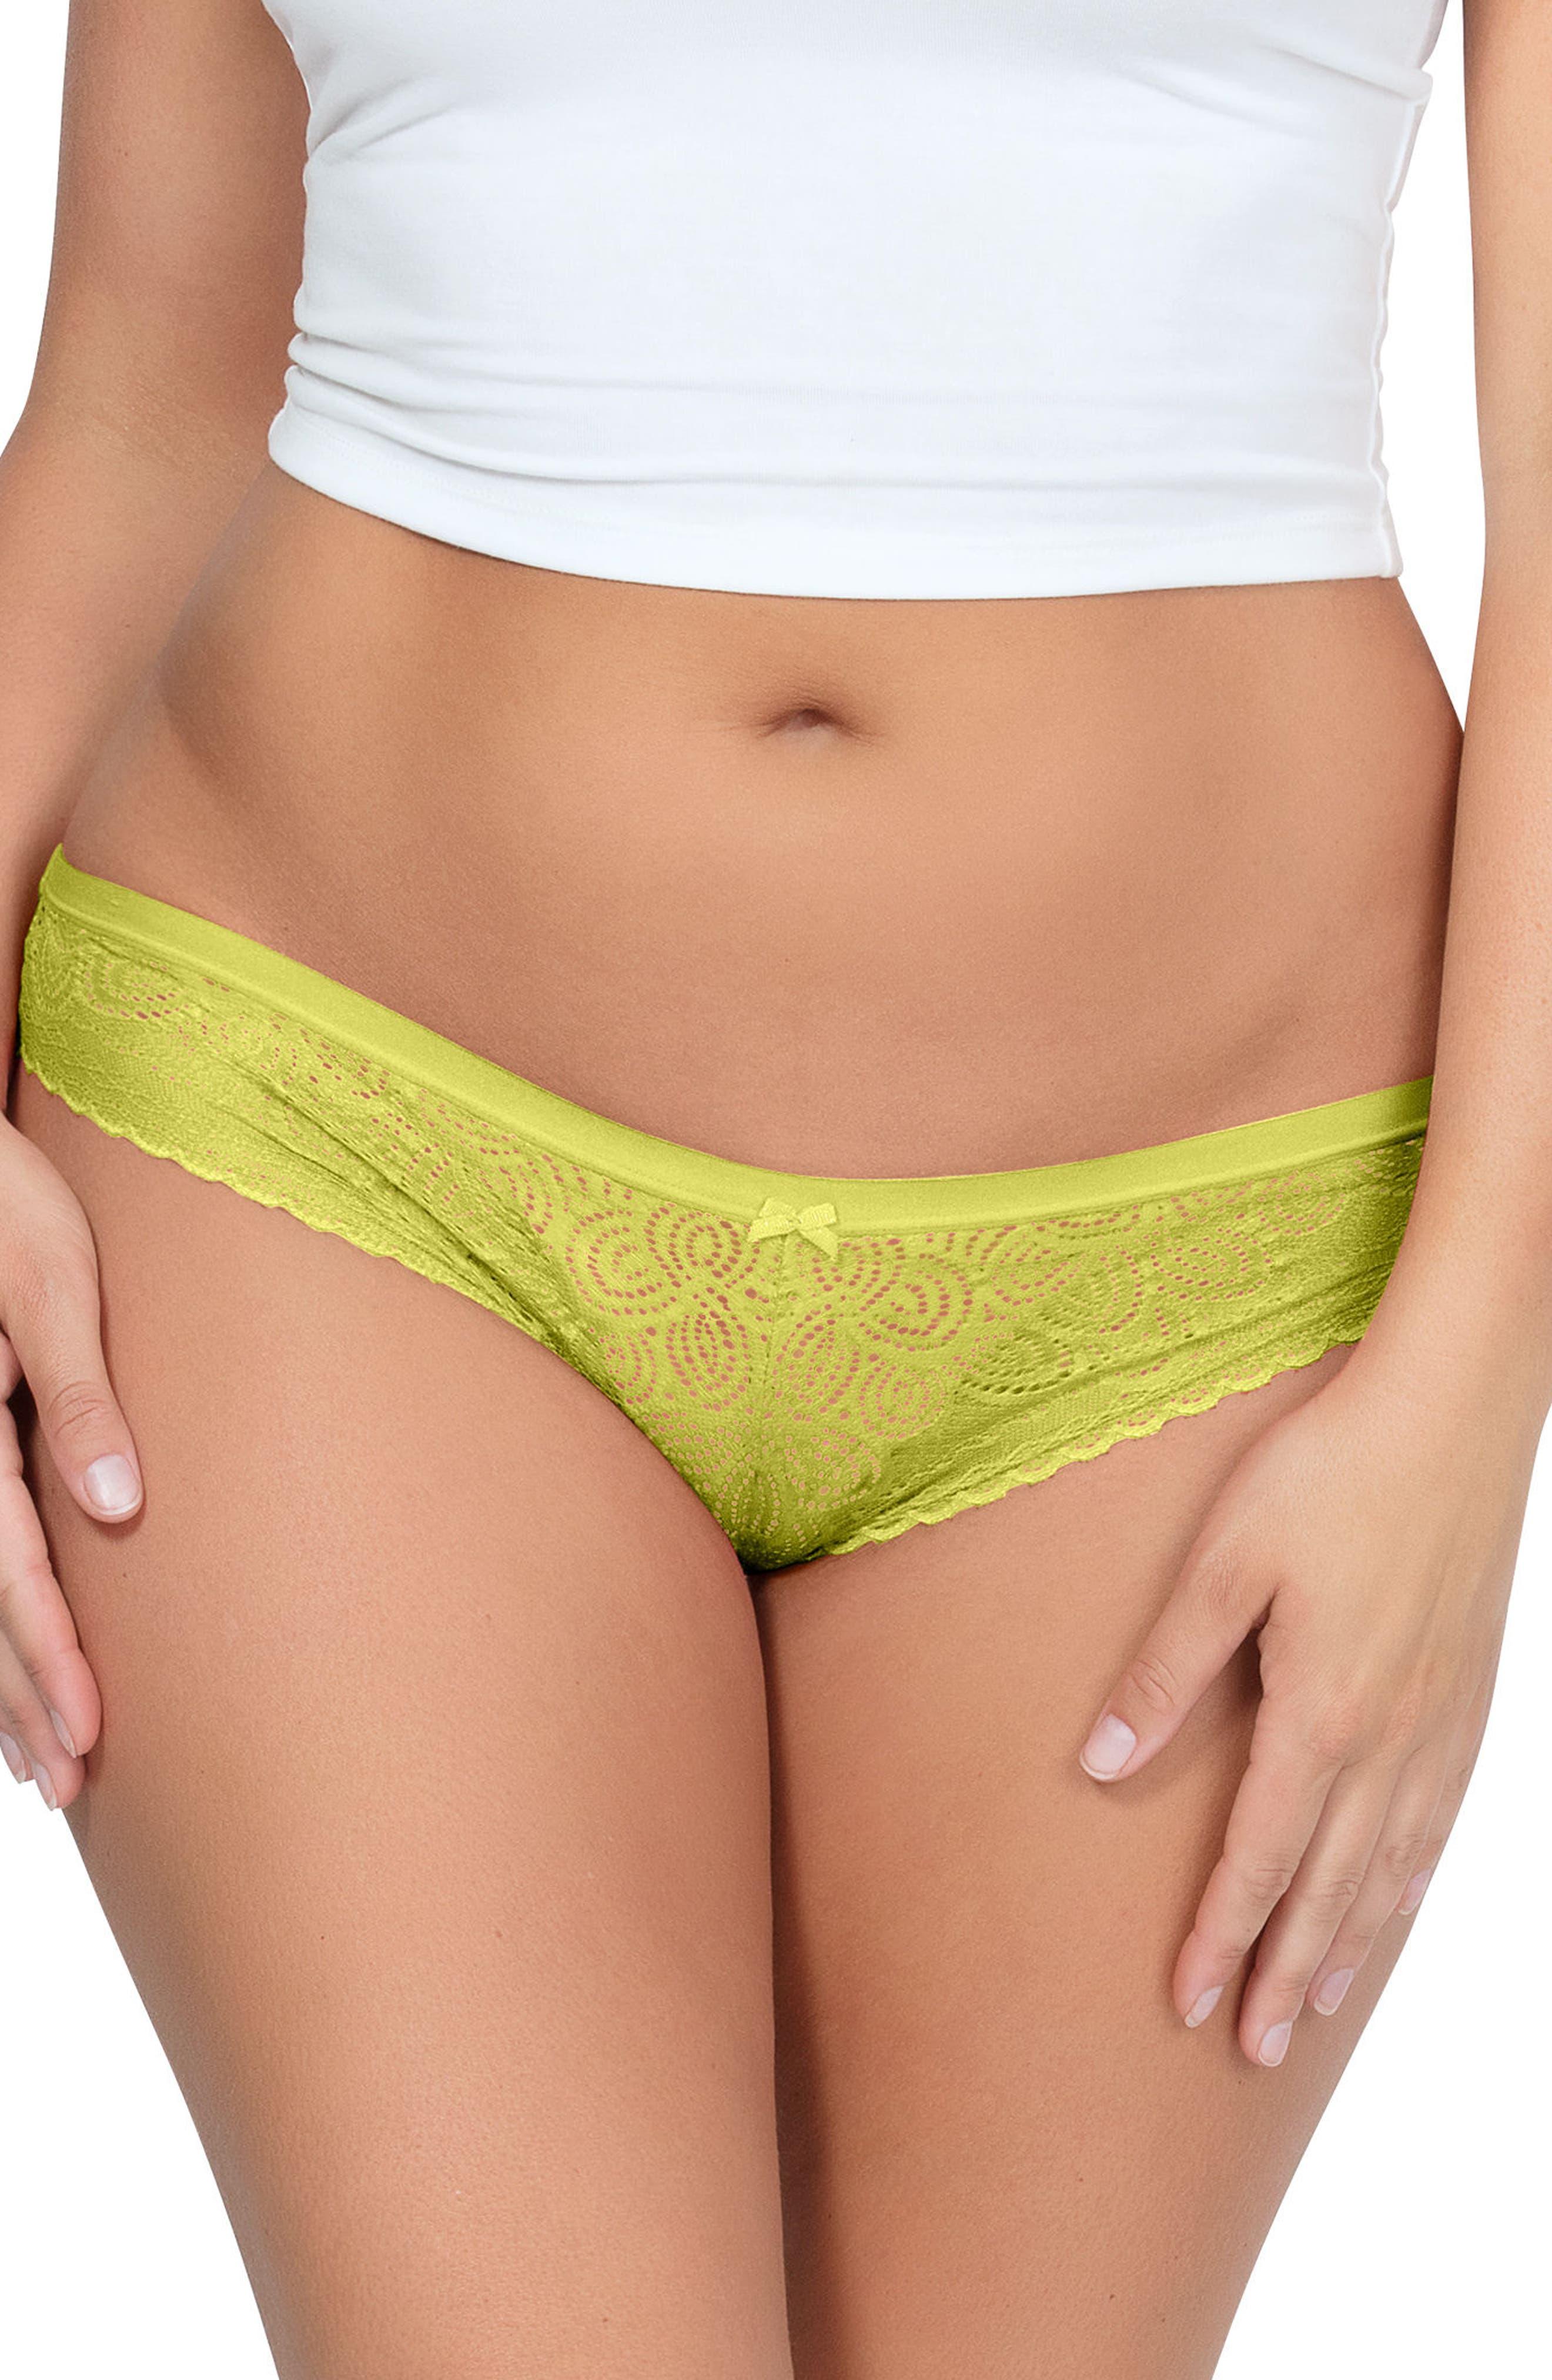 So Glam Bikini,                             Main thumbnail 1, color,                             Lemonade